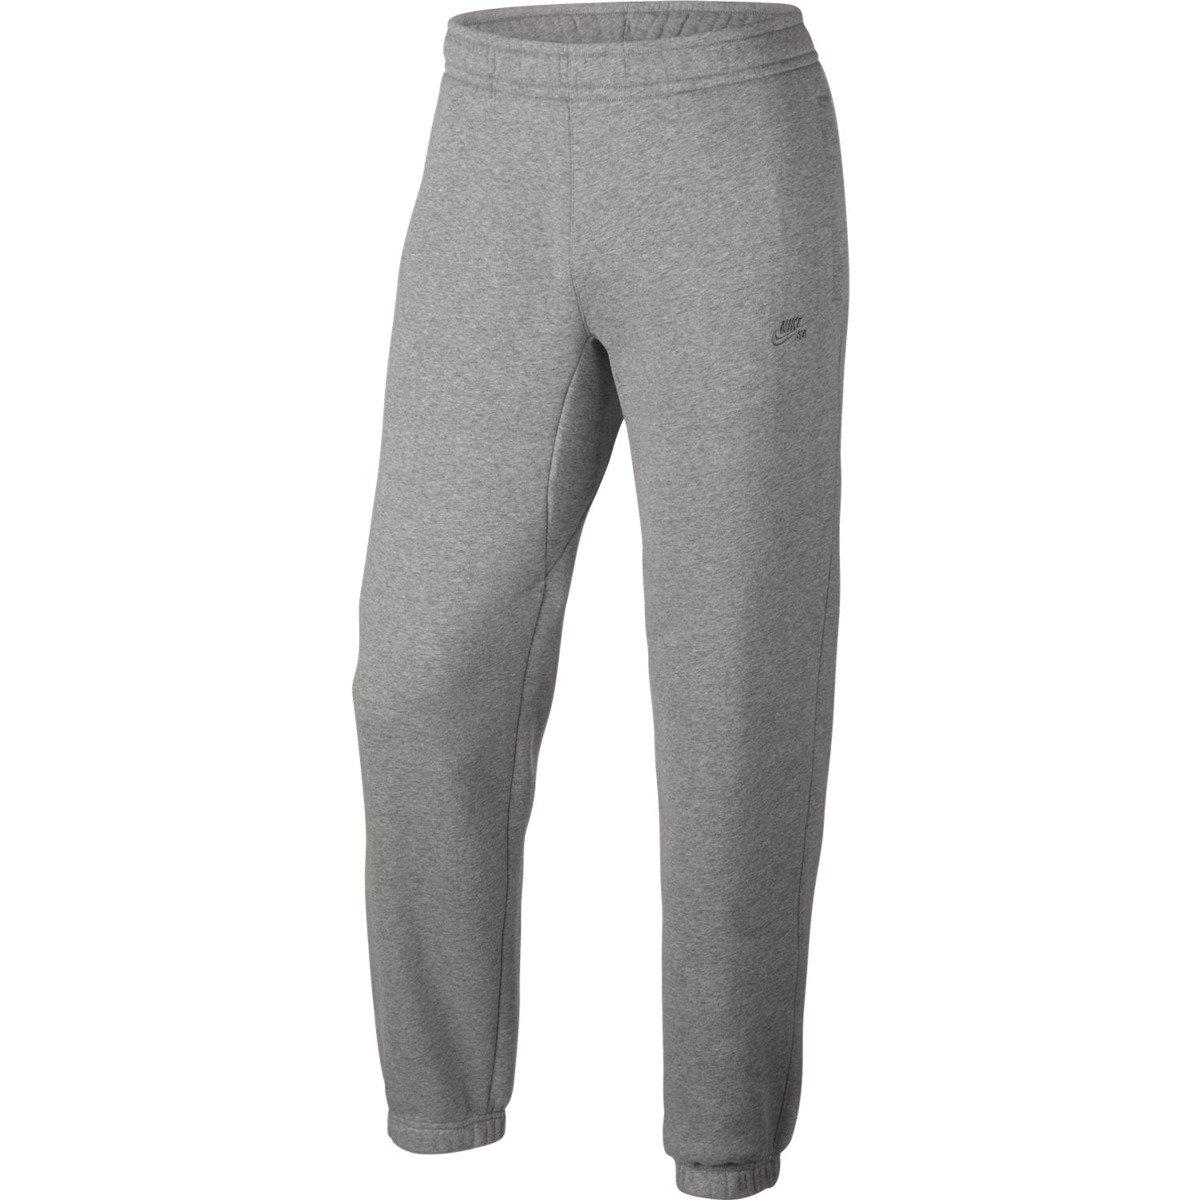 0105a54772a5 nike sb icon fleece pants dk grey heather dark steel grey grey ...